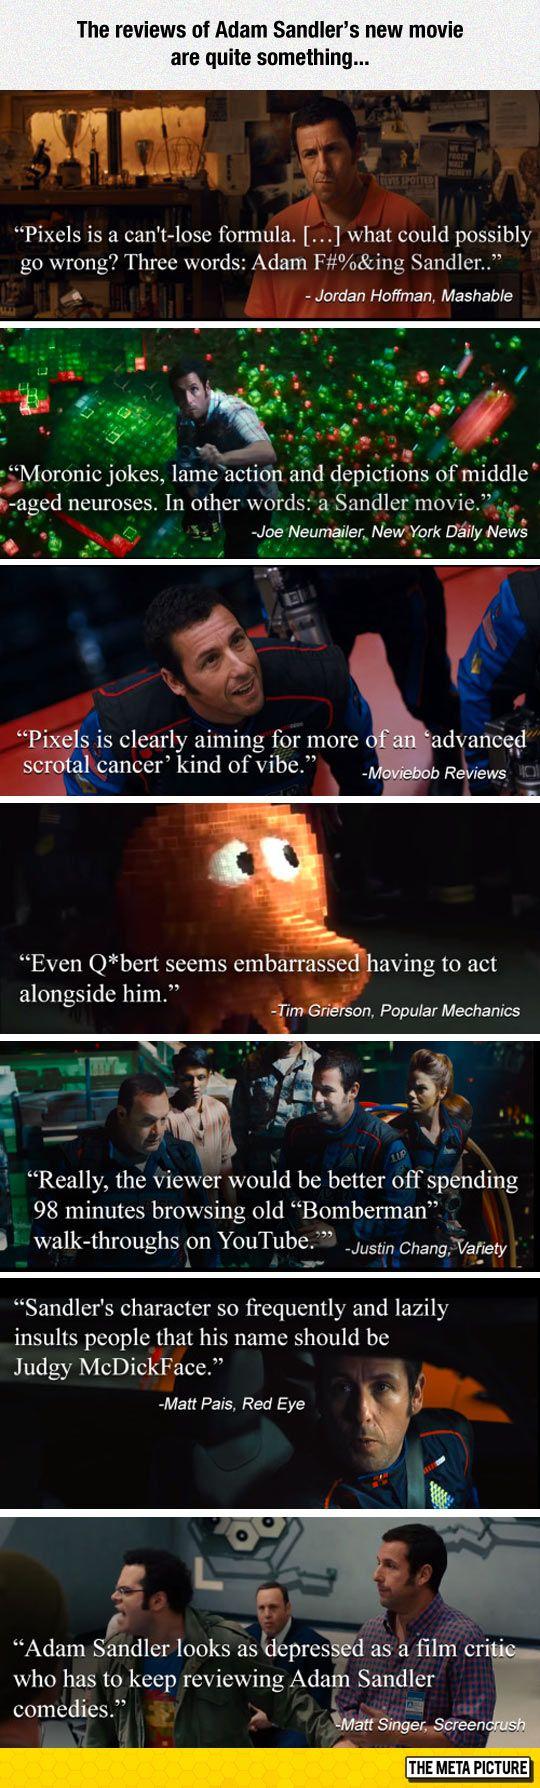 Adam Sandler's New Movie Reviews